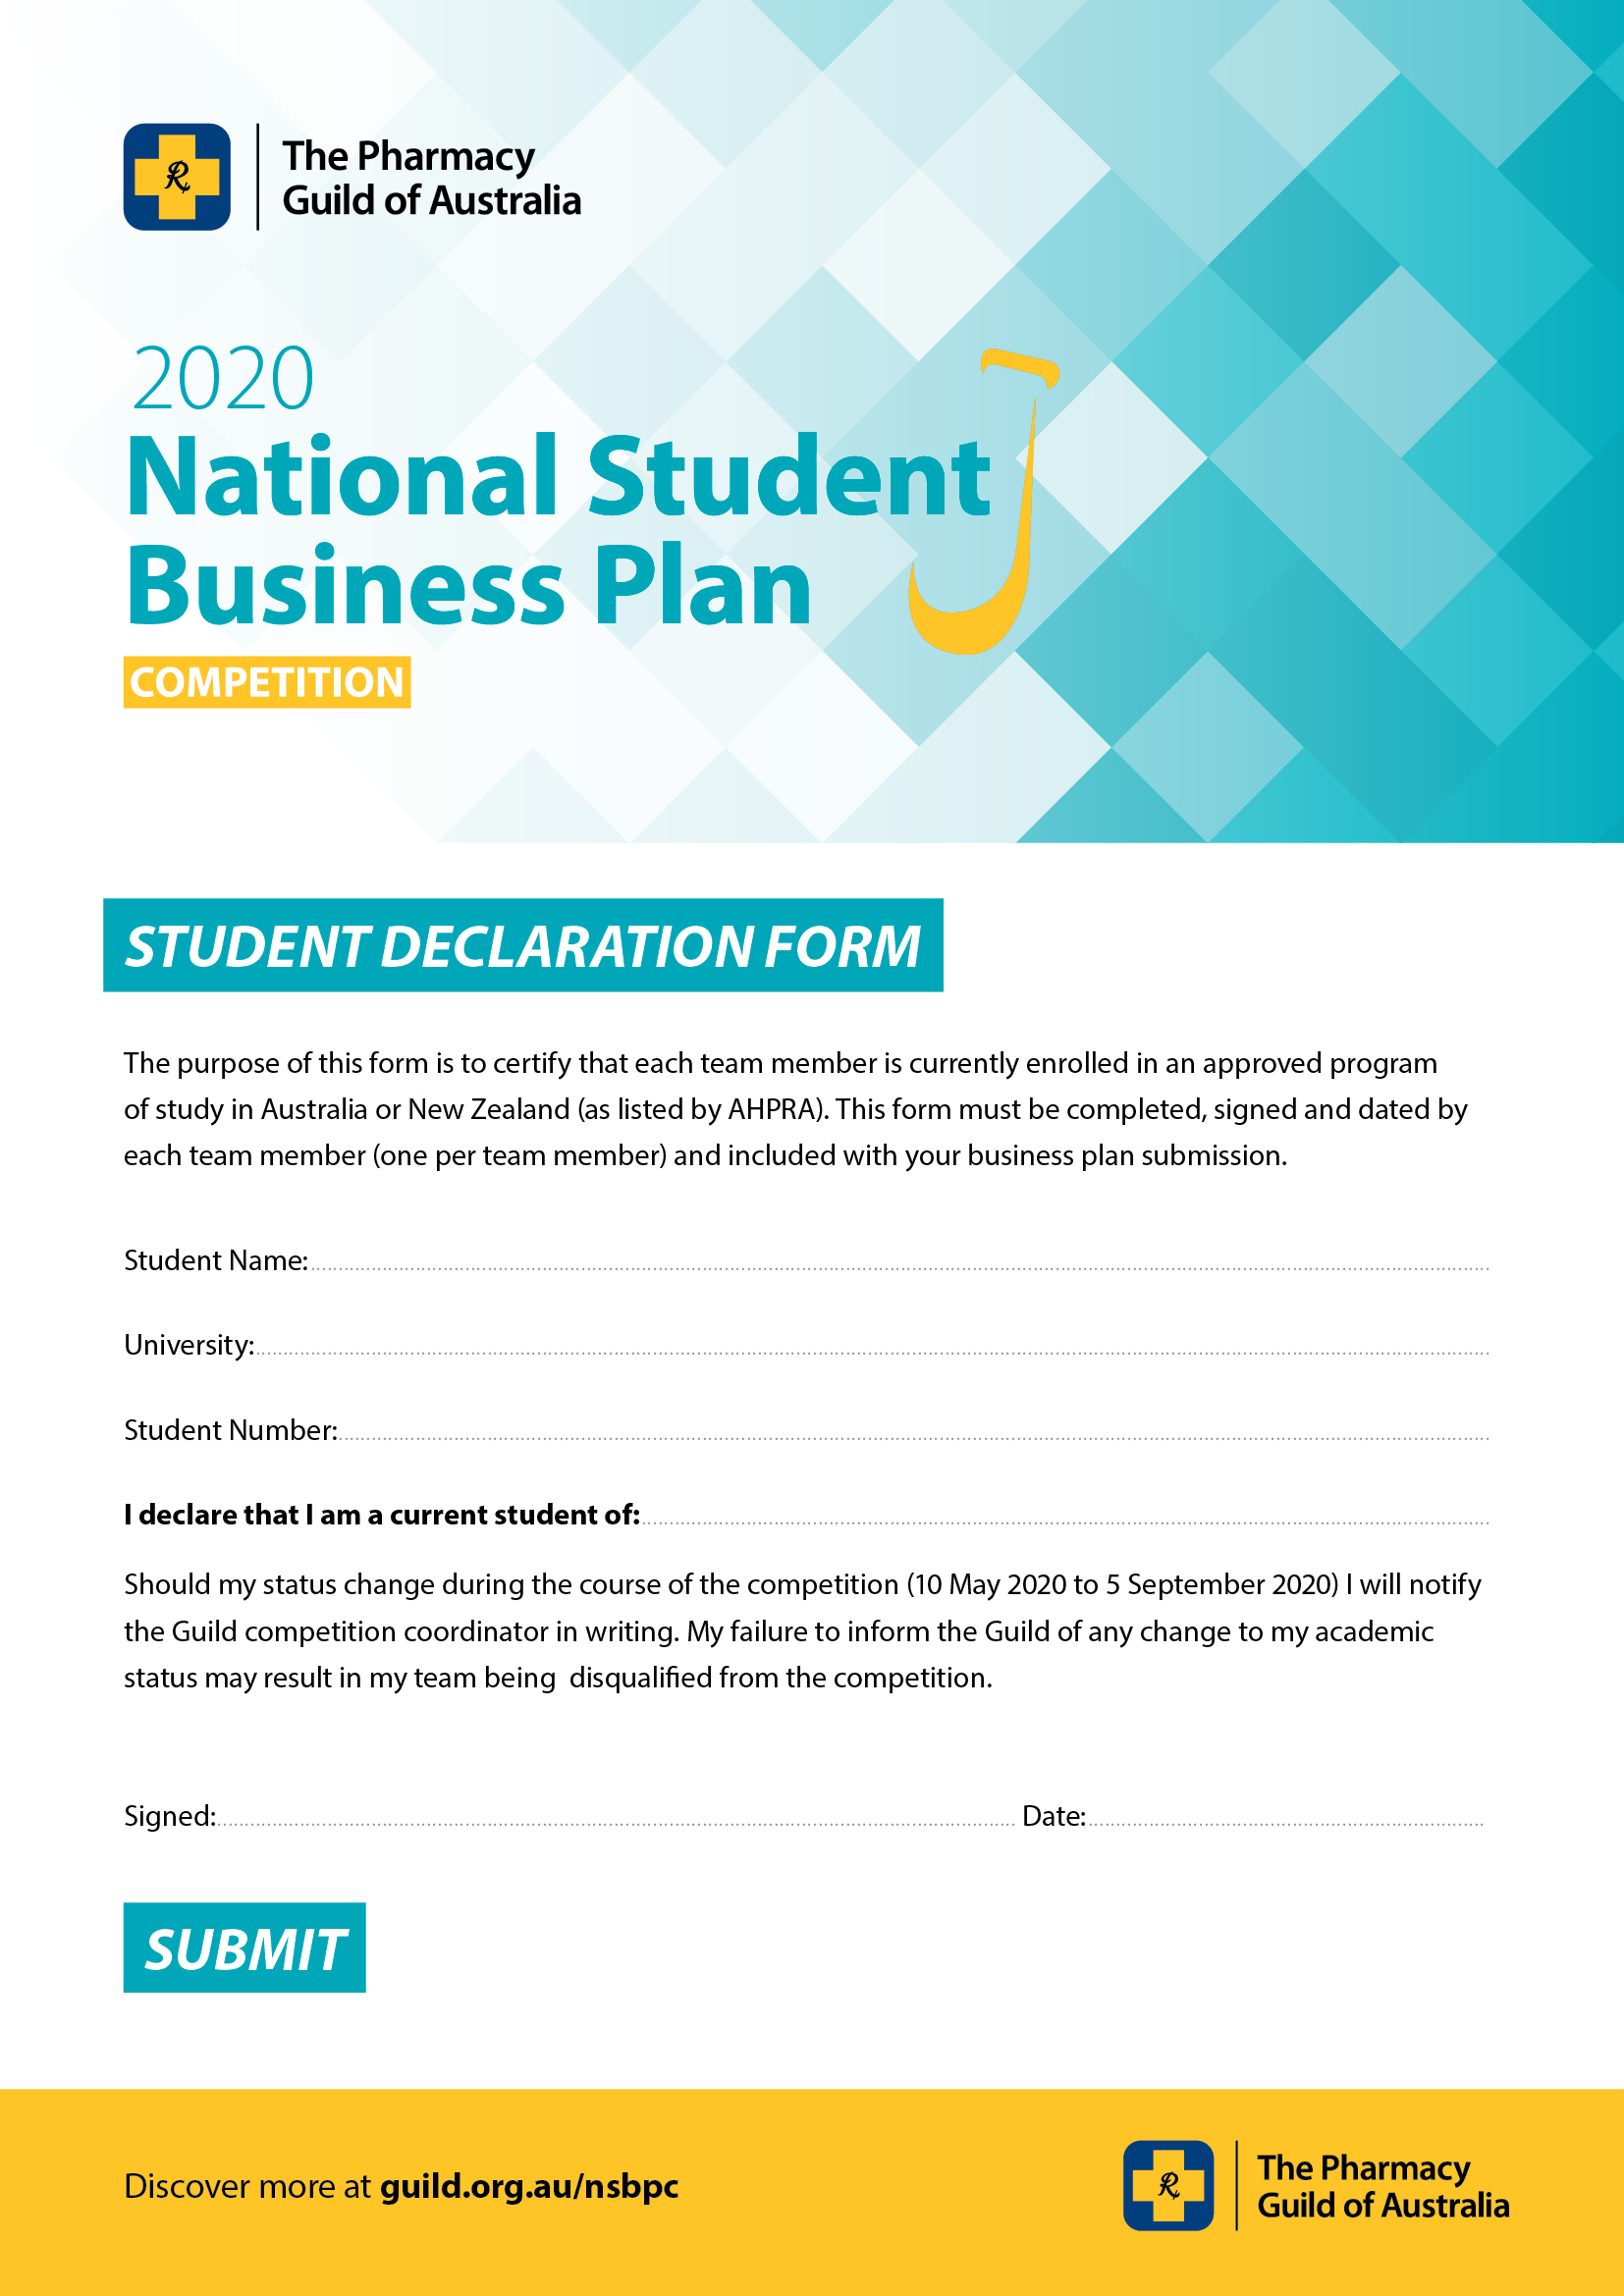 NSBPC2020 Declaration Image